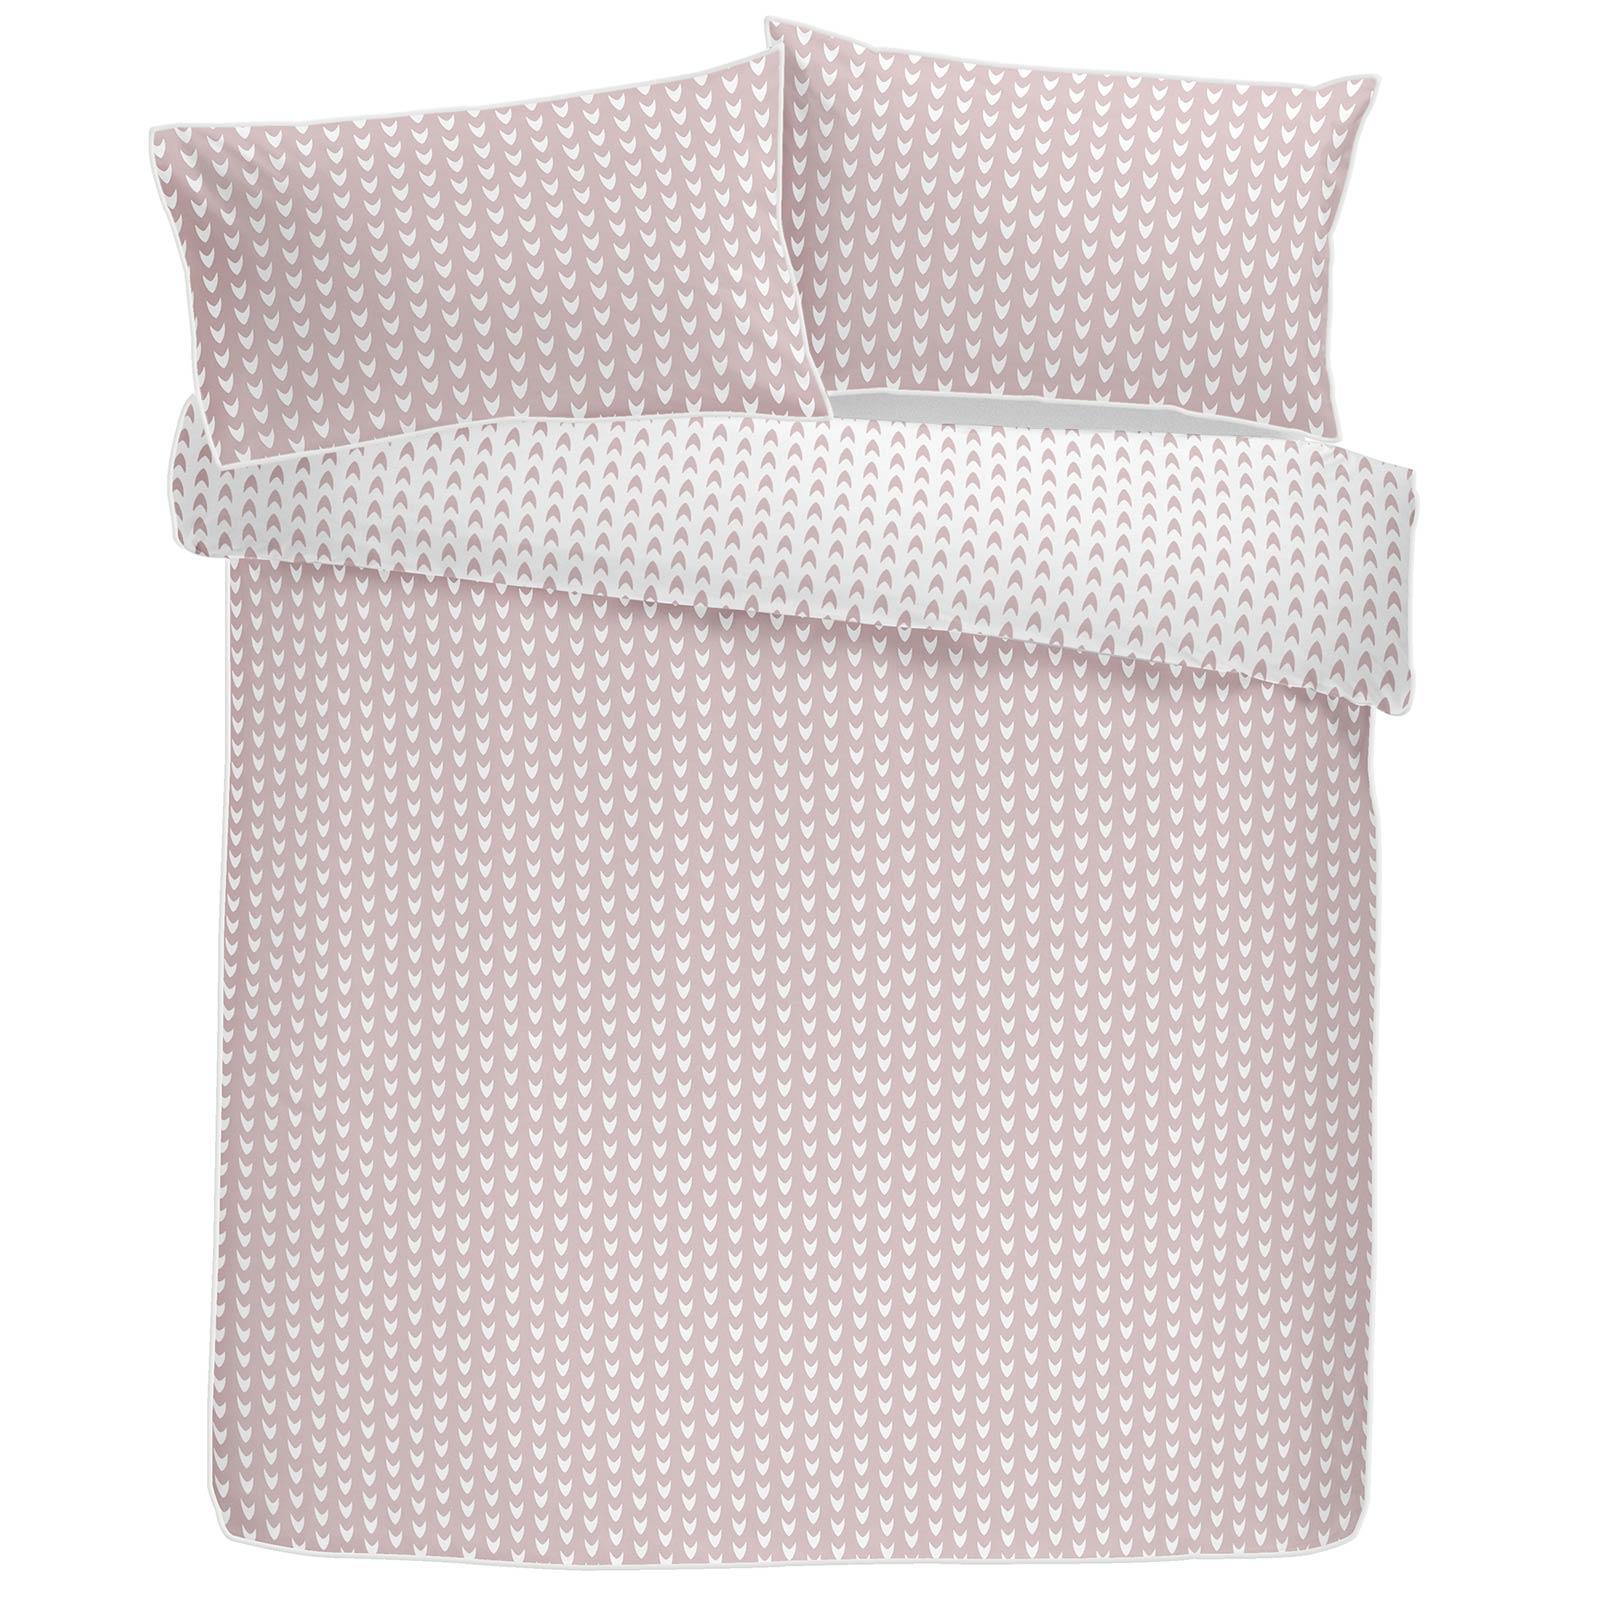 Blush-fundas-nordicas-Rosa-Geometrico-100-Algodon-Edredon-Reversible-conjuntos-de-cama miniatura 5